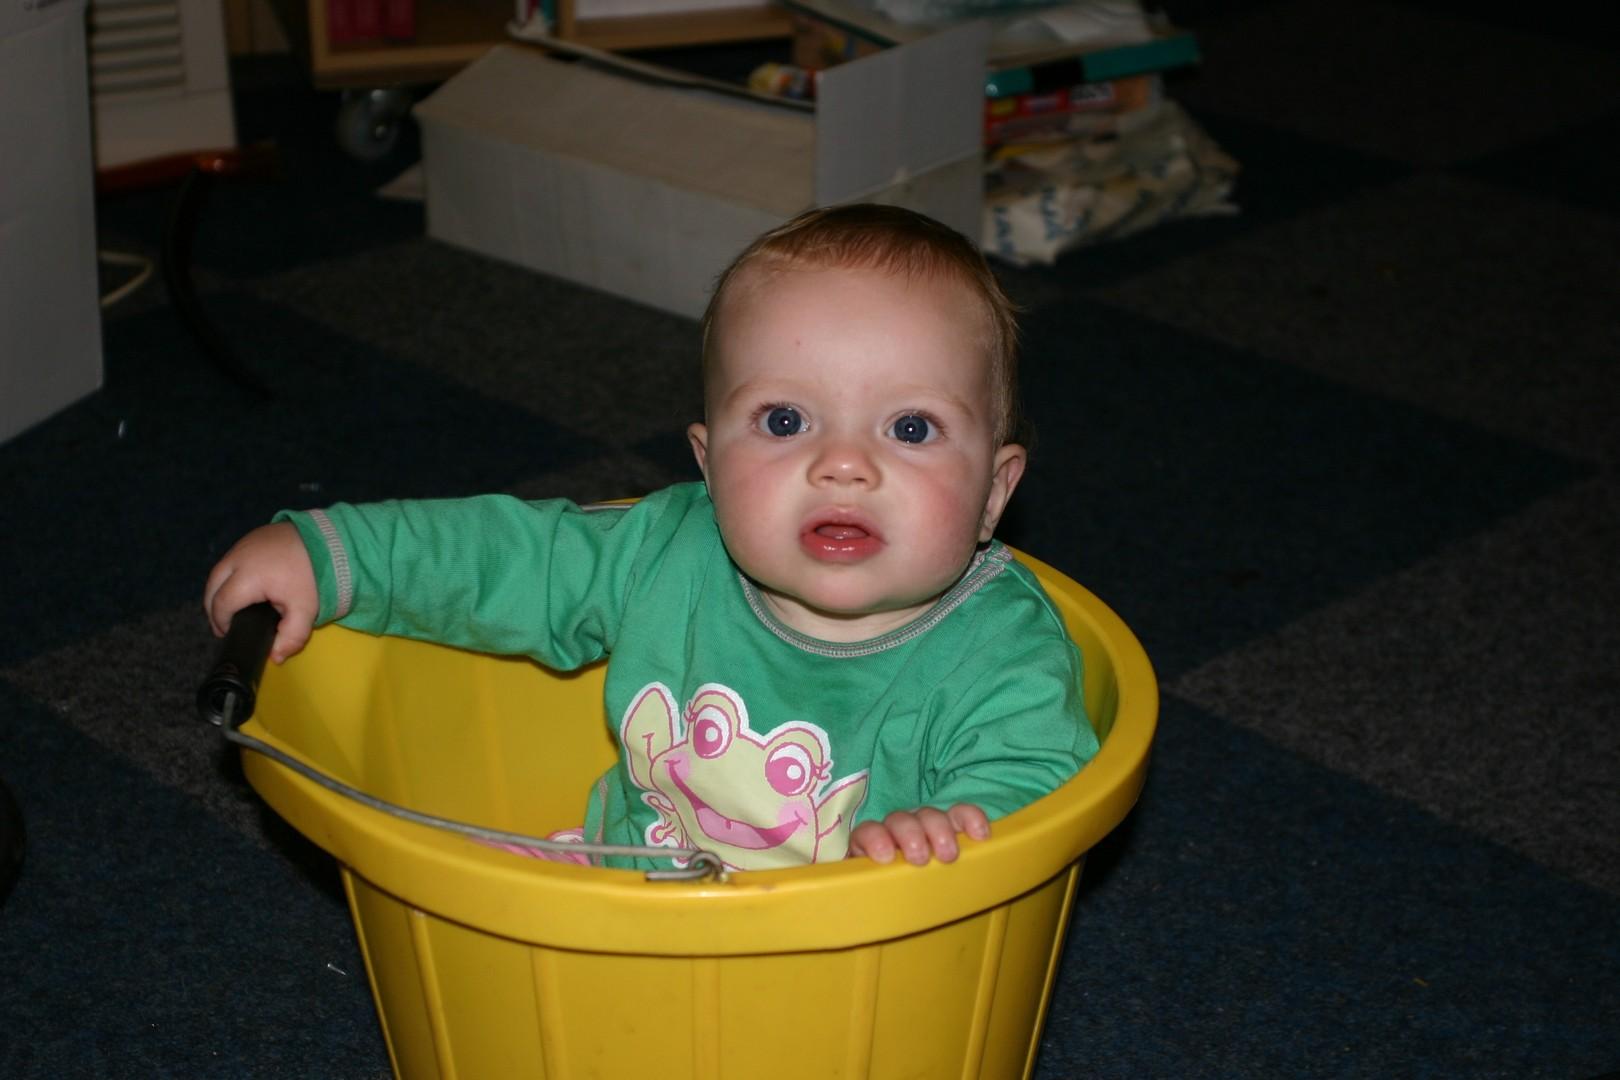 A bucket of fun